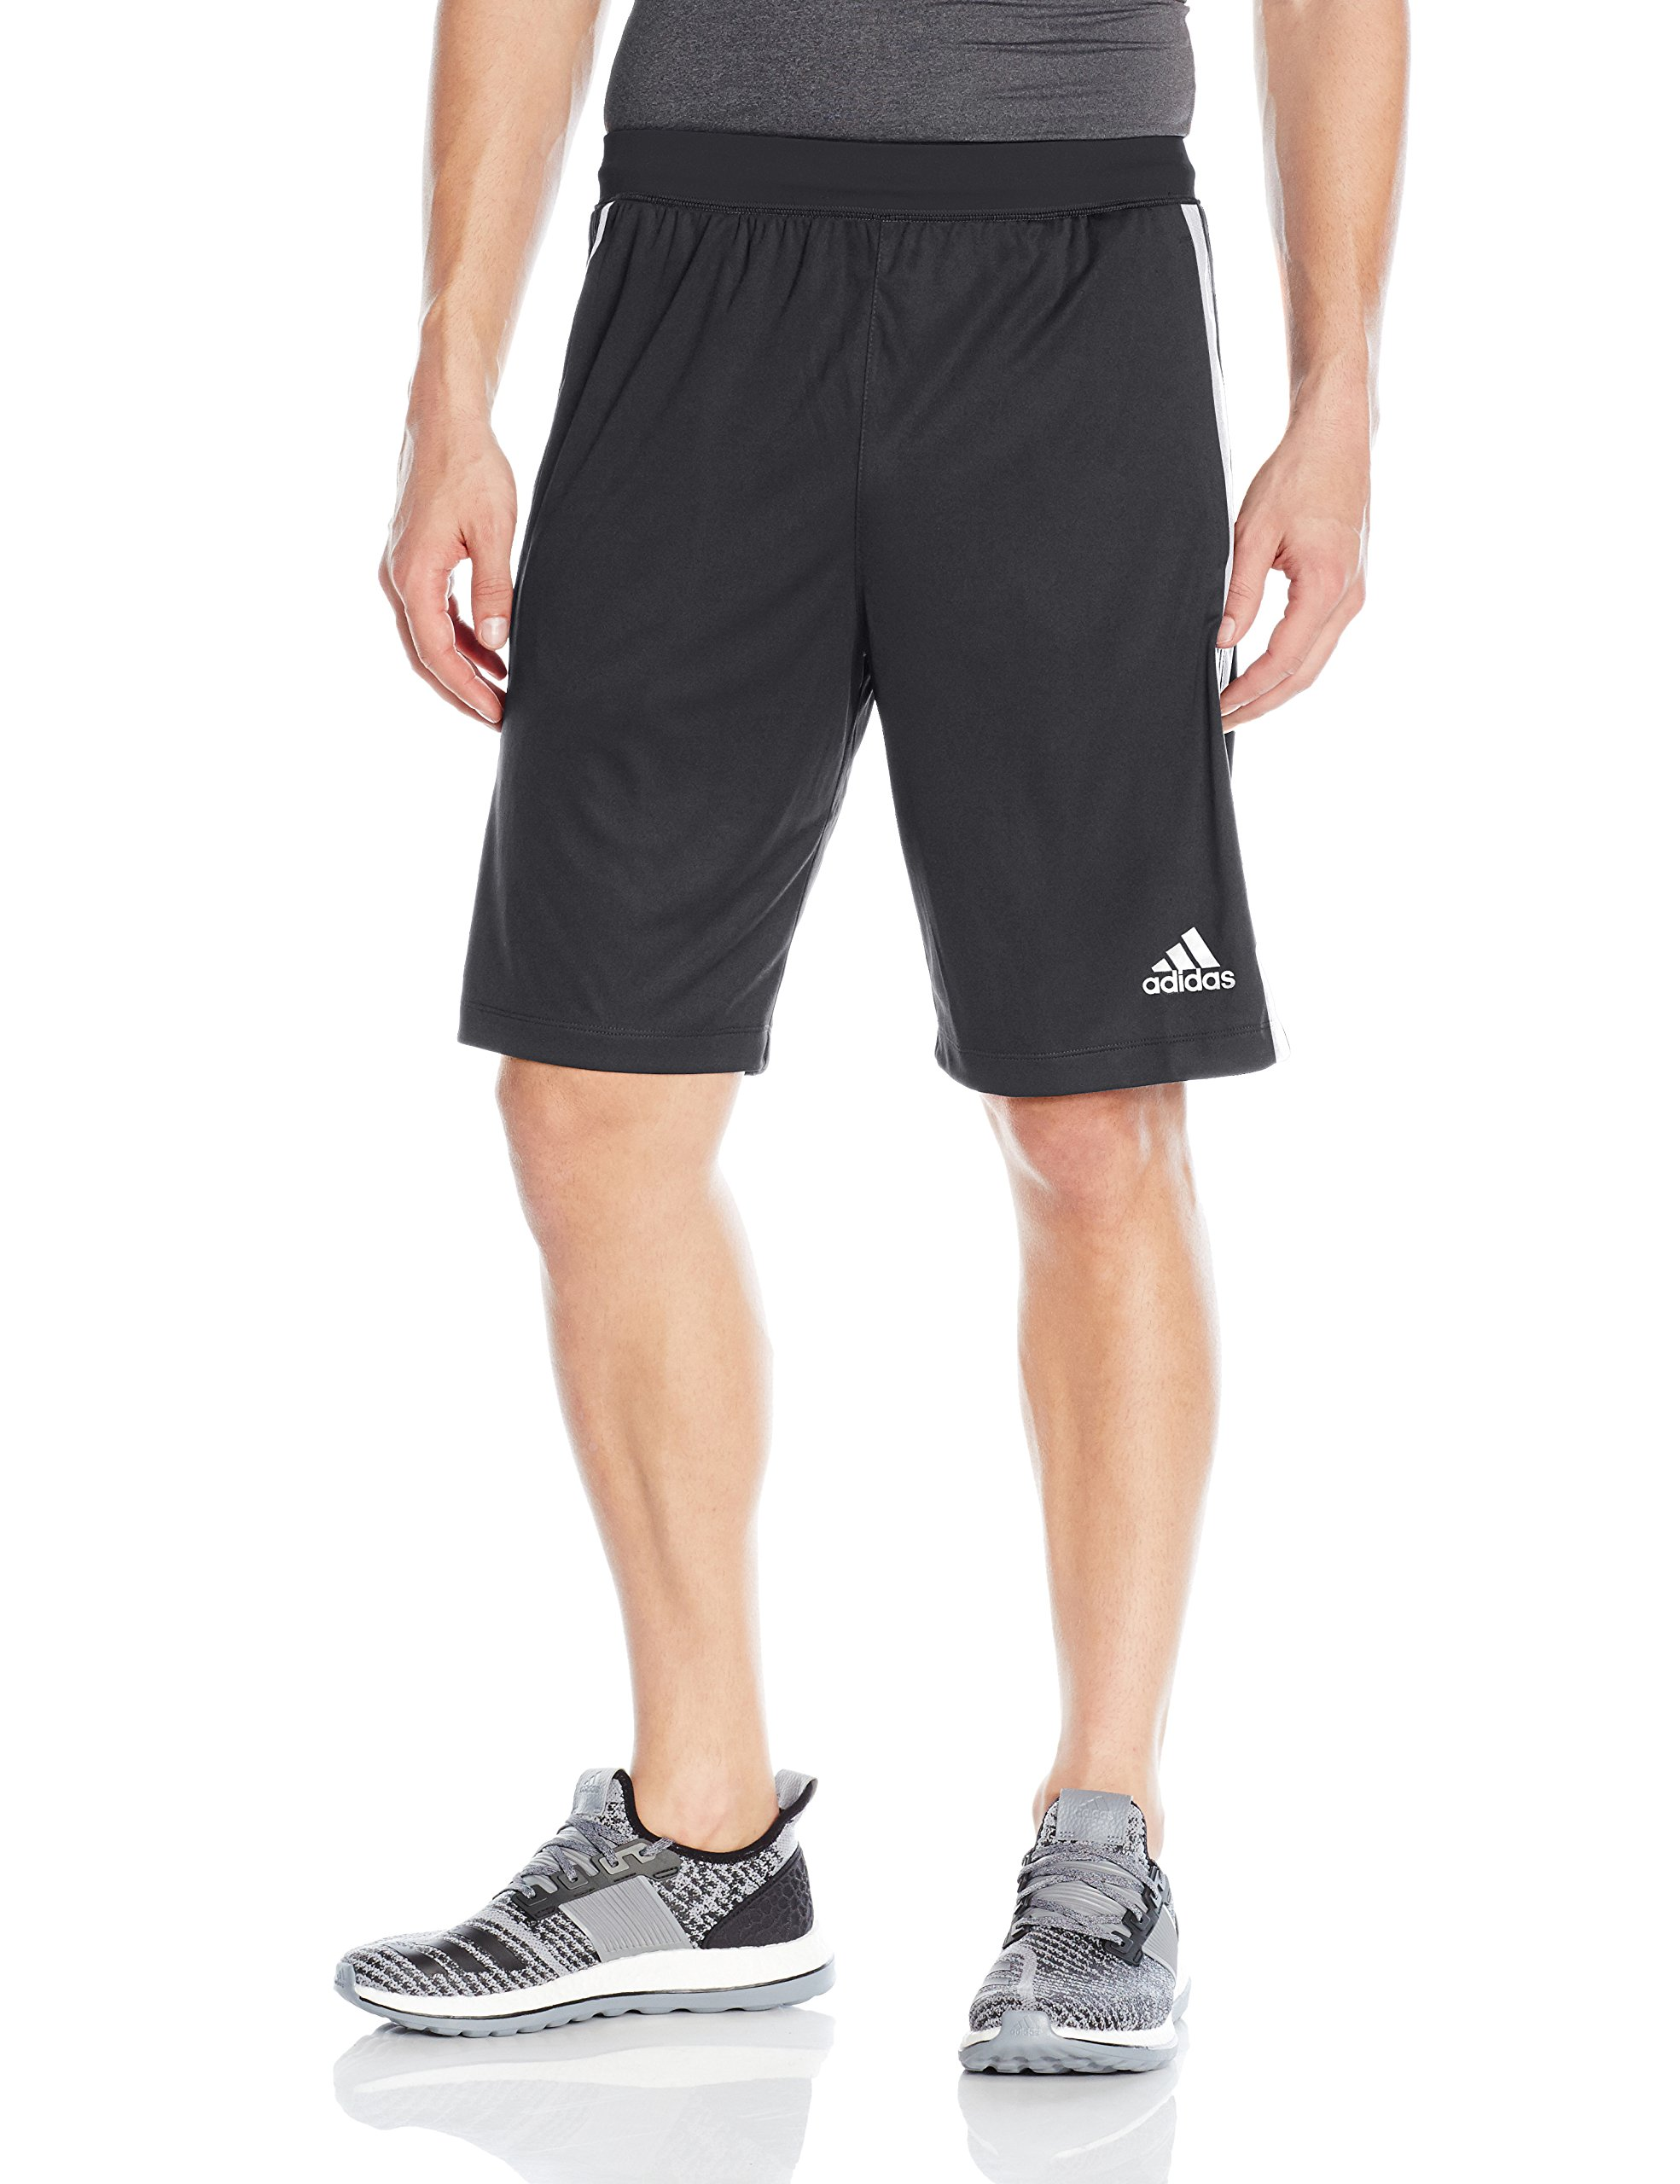 adidas Men's Designed-2-Move 3-Stripe Shorts, Black/White, X-Small